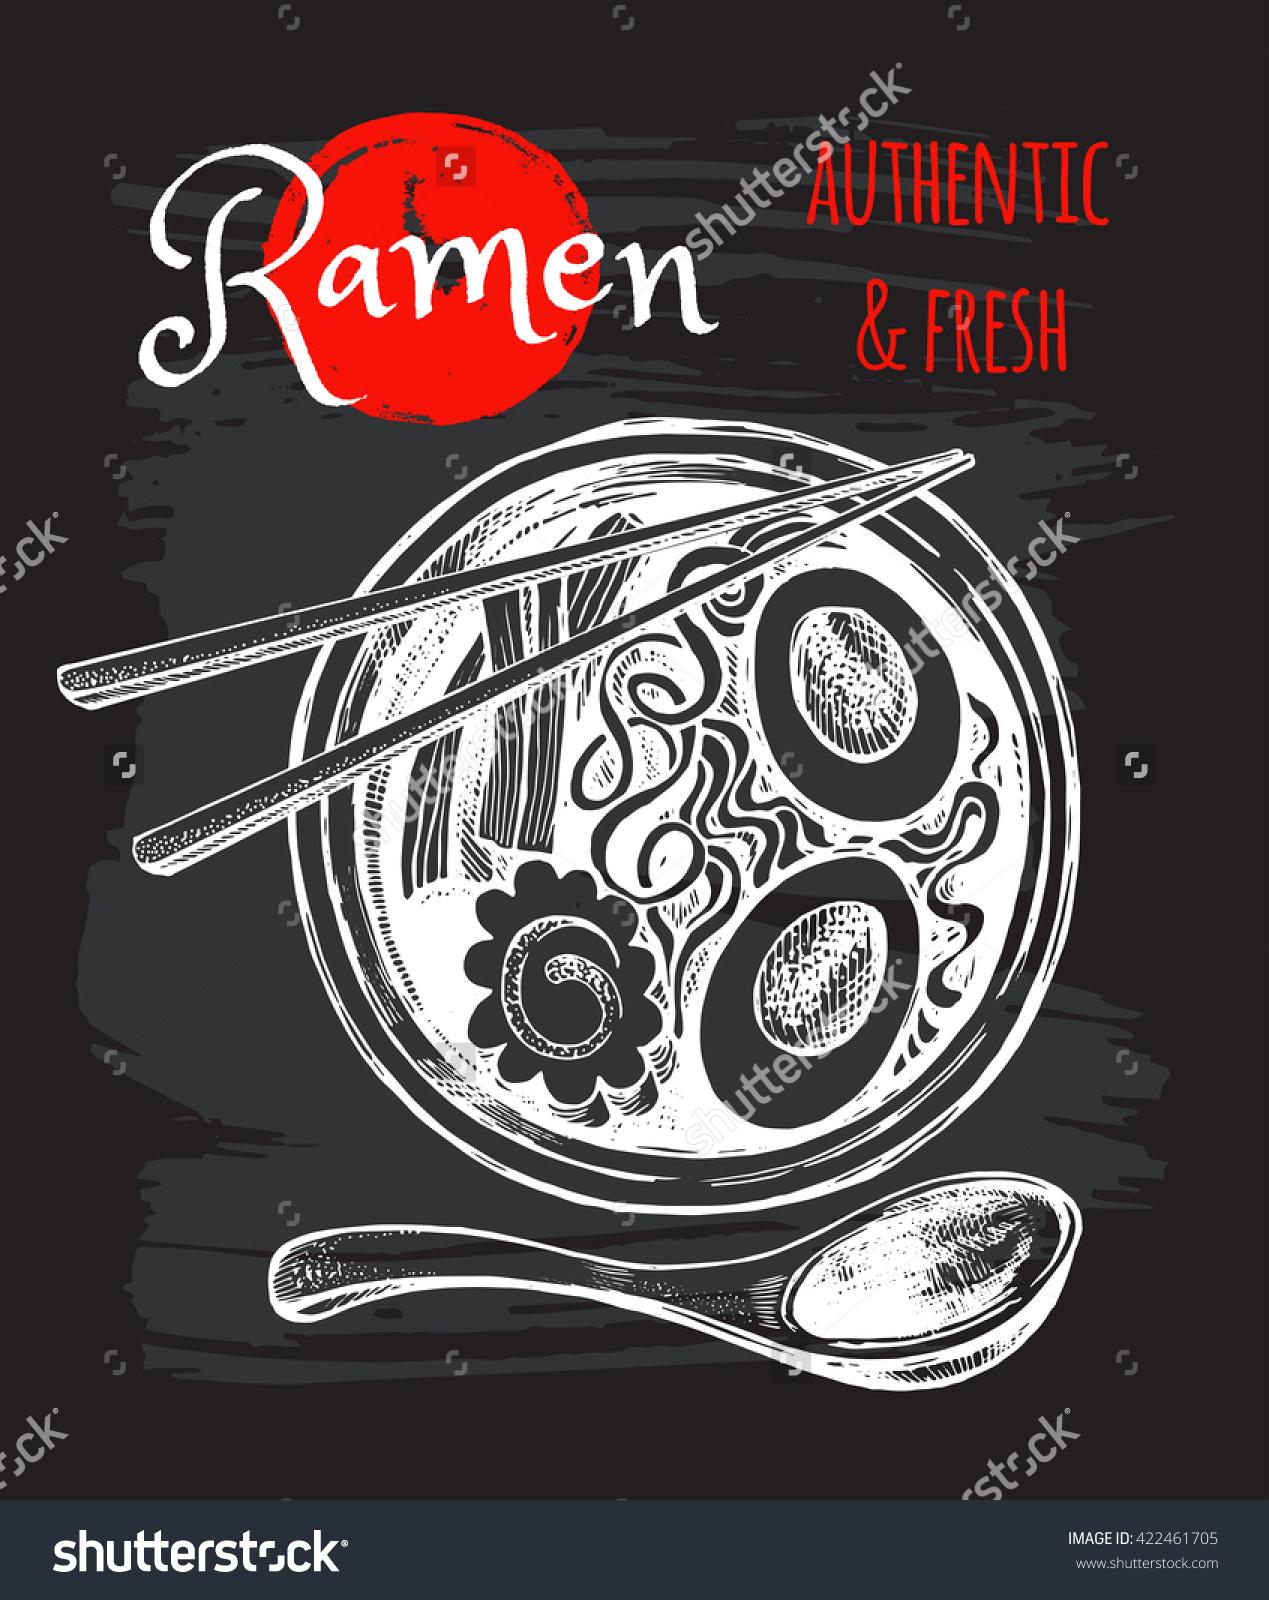 Japanese Cuisine Soup Ramen Vector Hand Stock Vector 422461705.